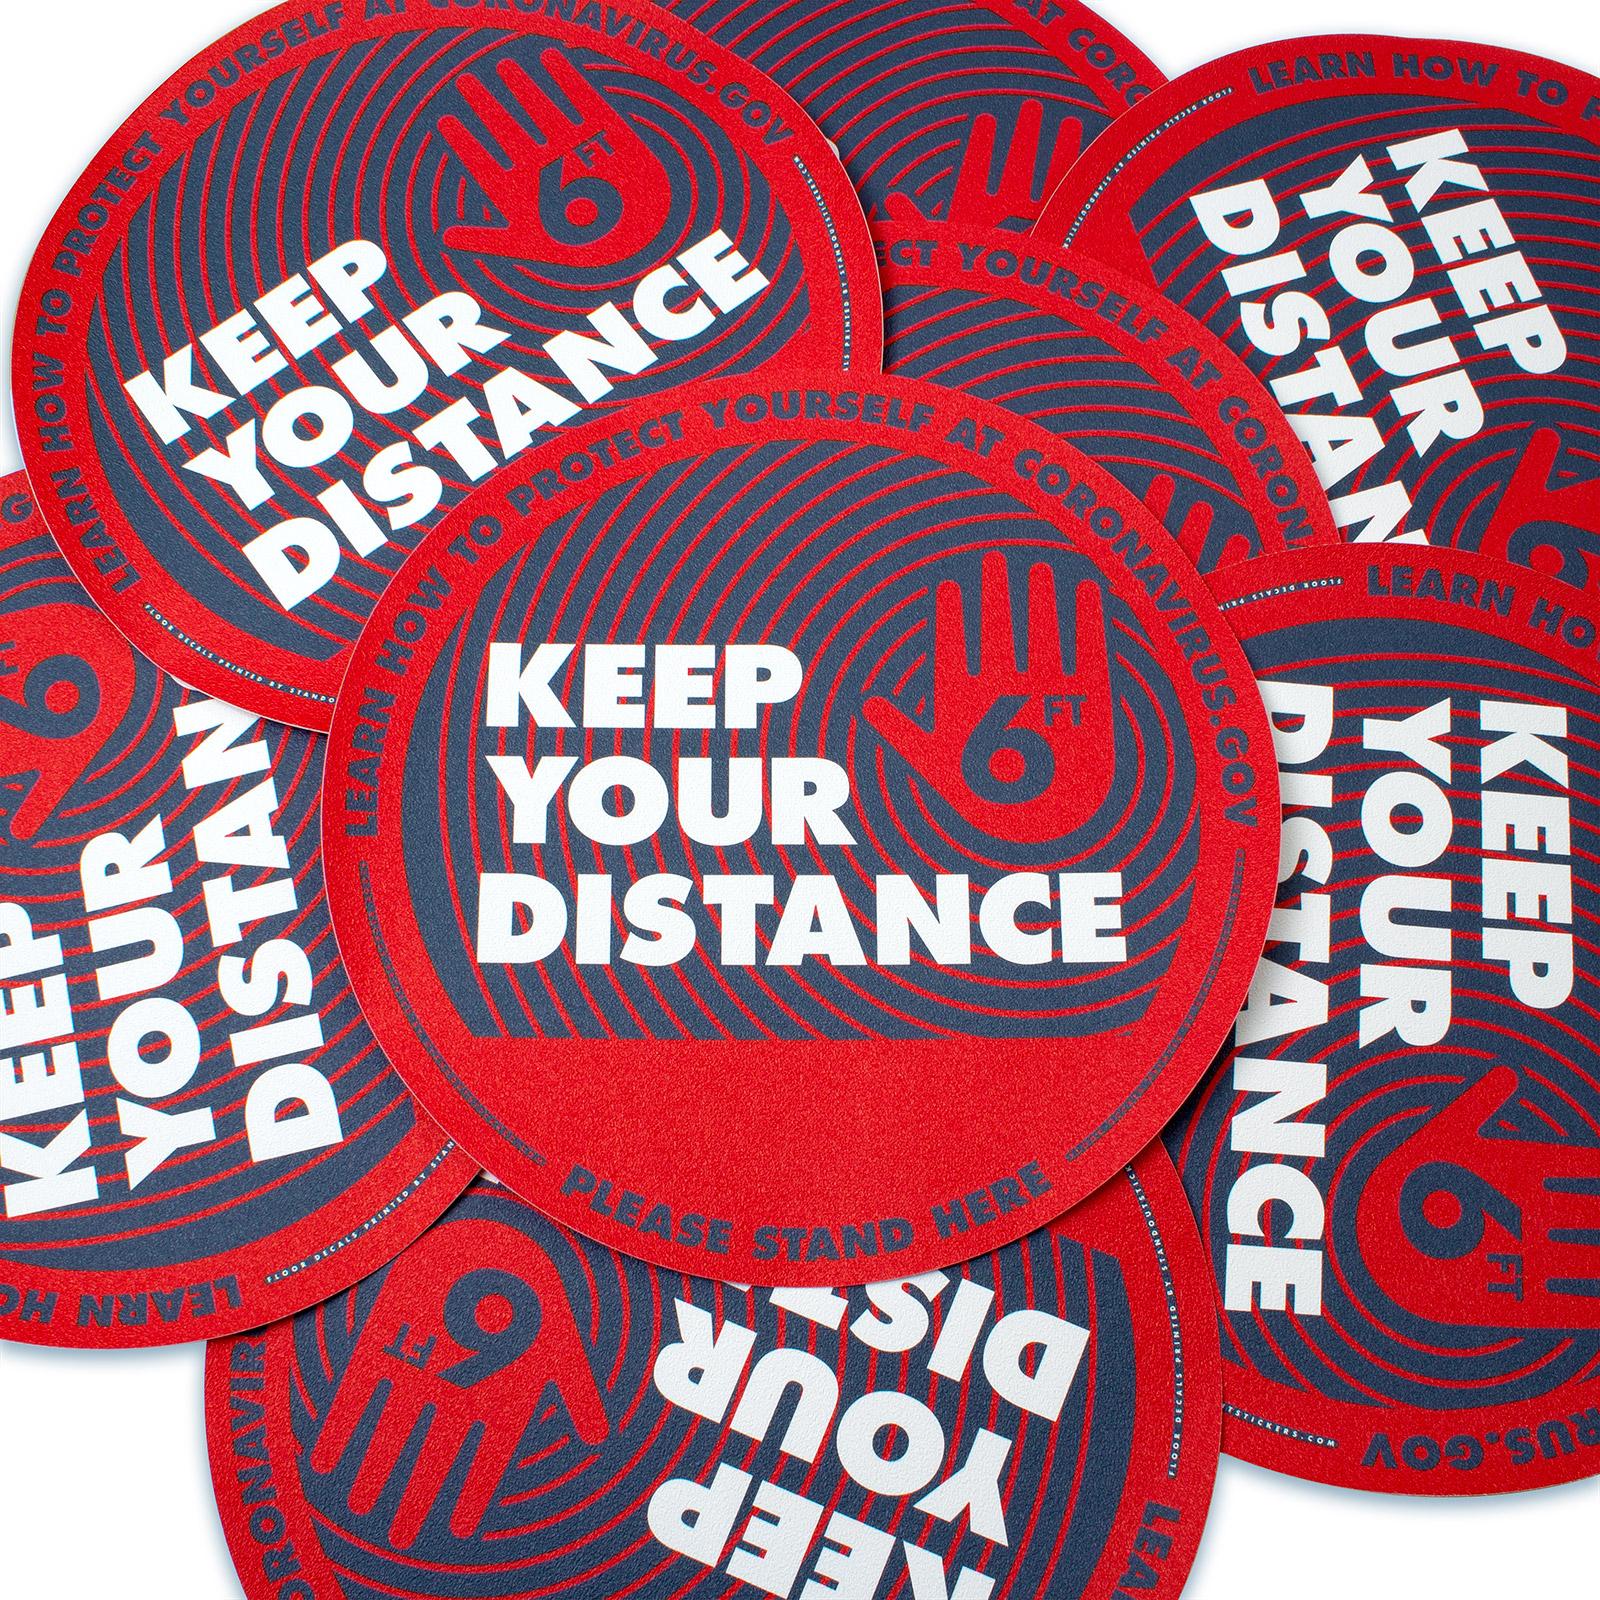 Keep Your Distance Floor Decal